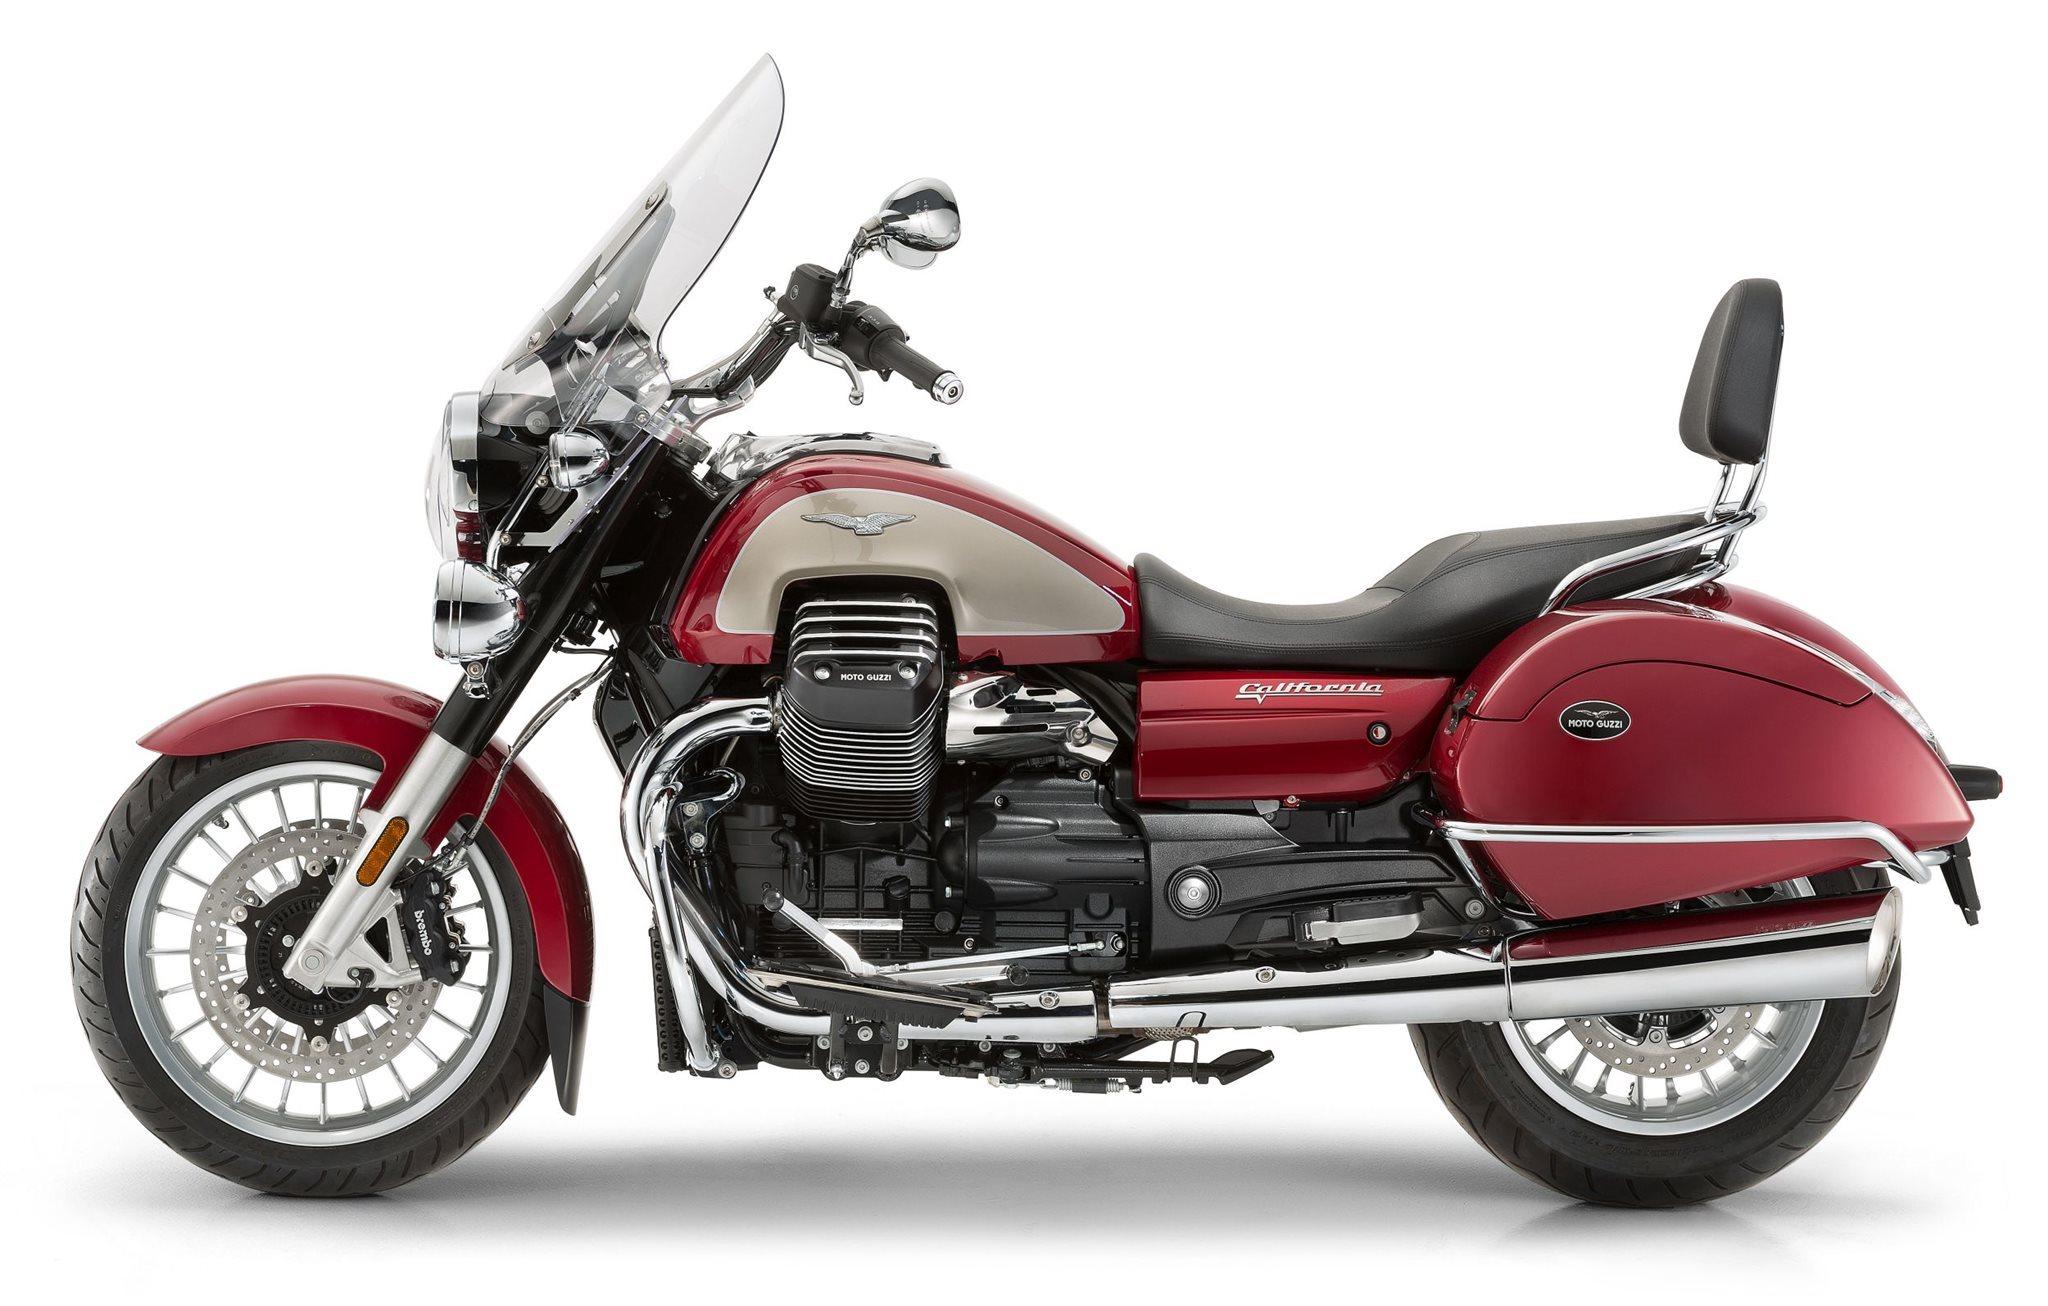 Moto Guzzi California 1400 Touring SE